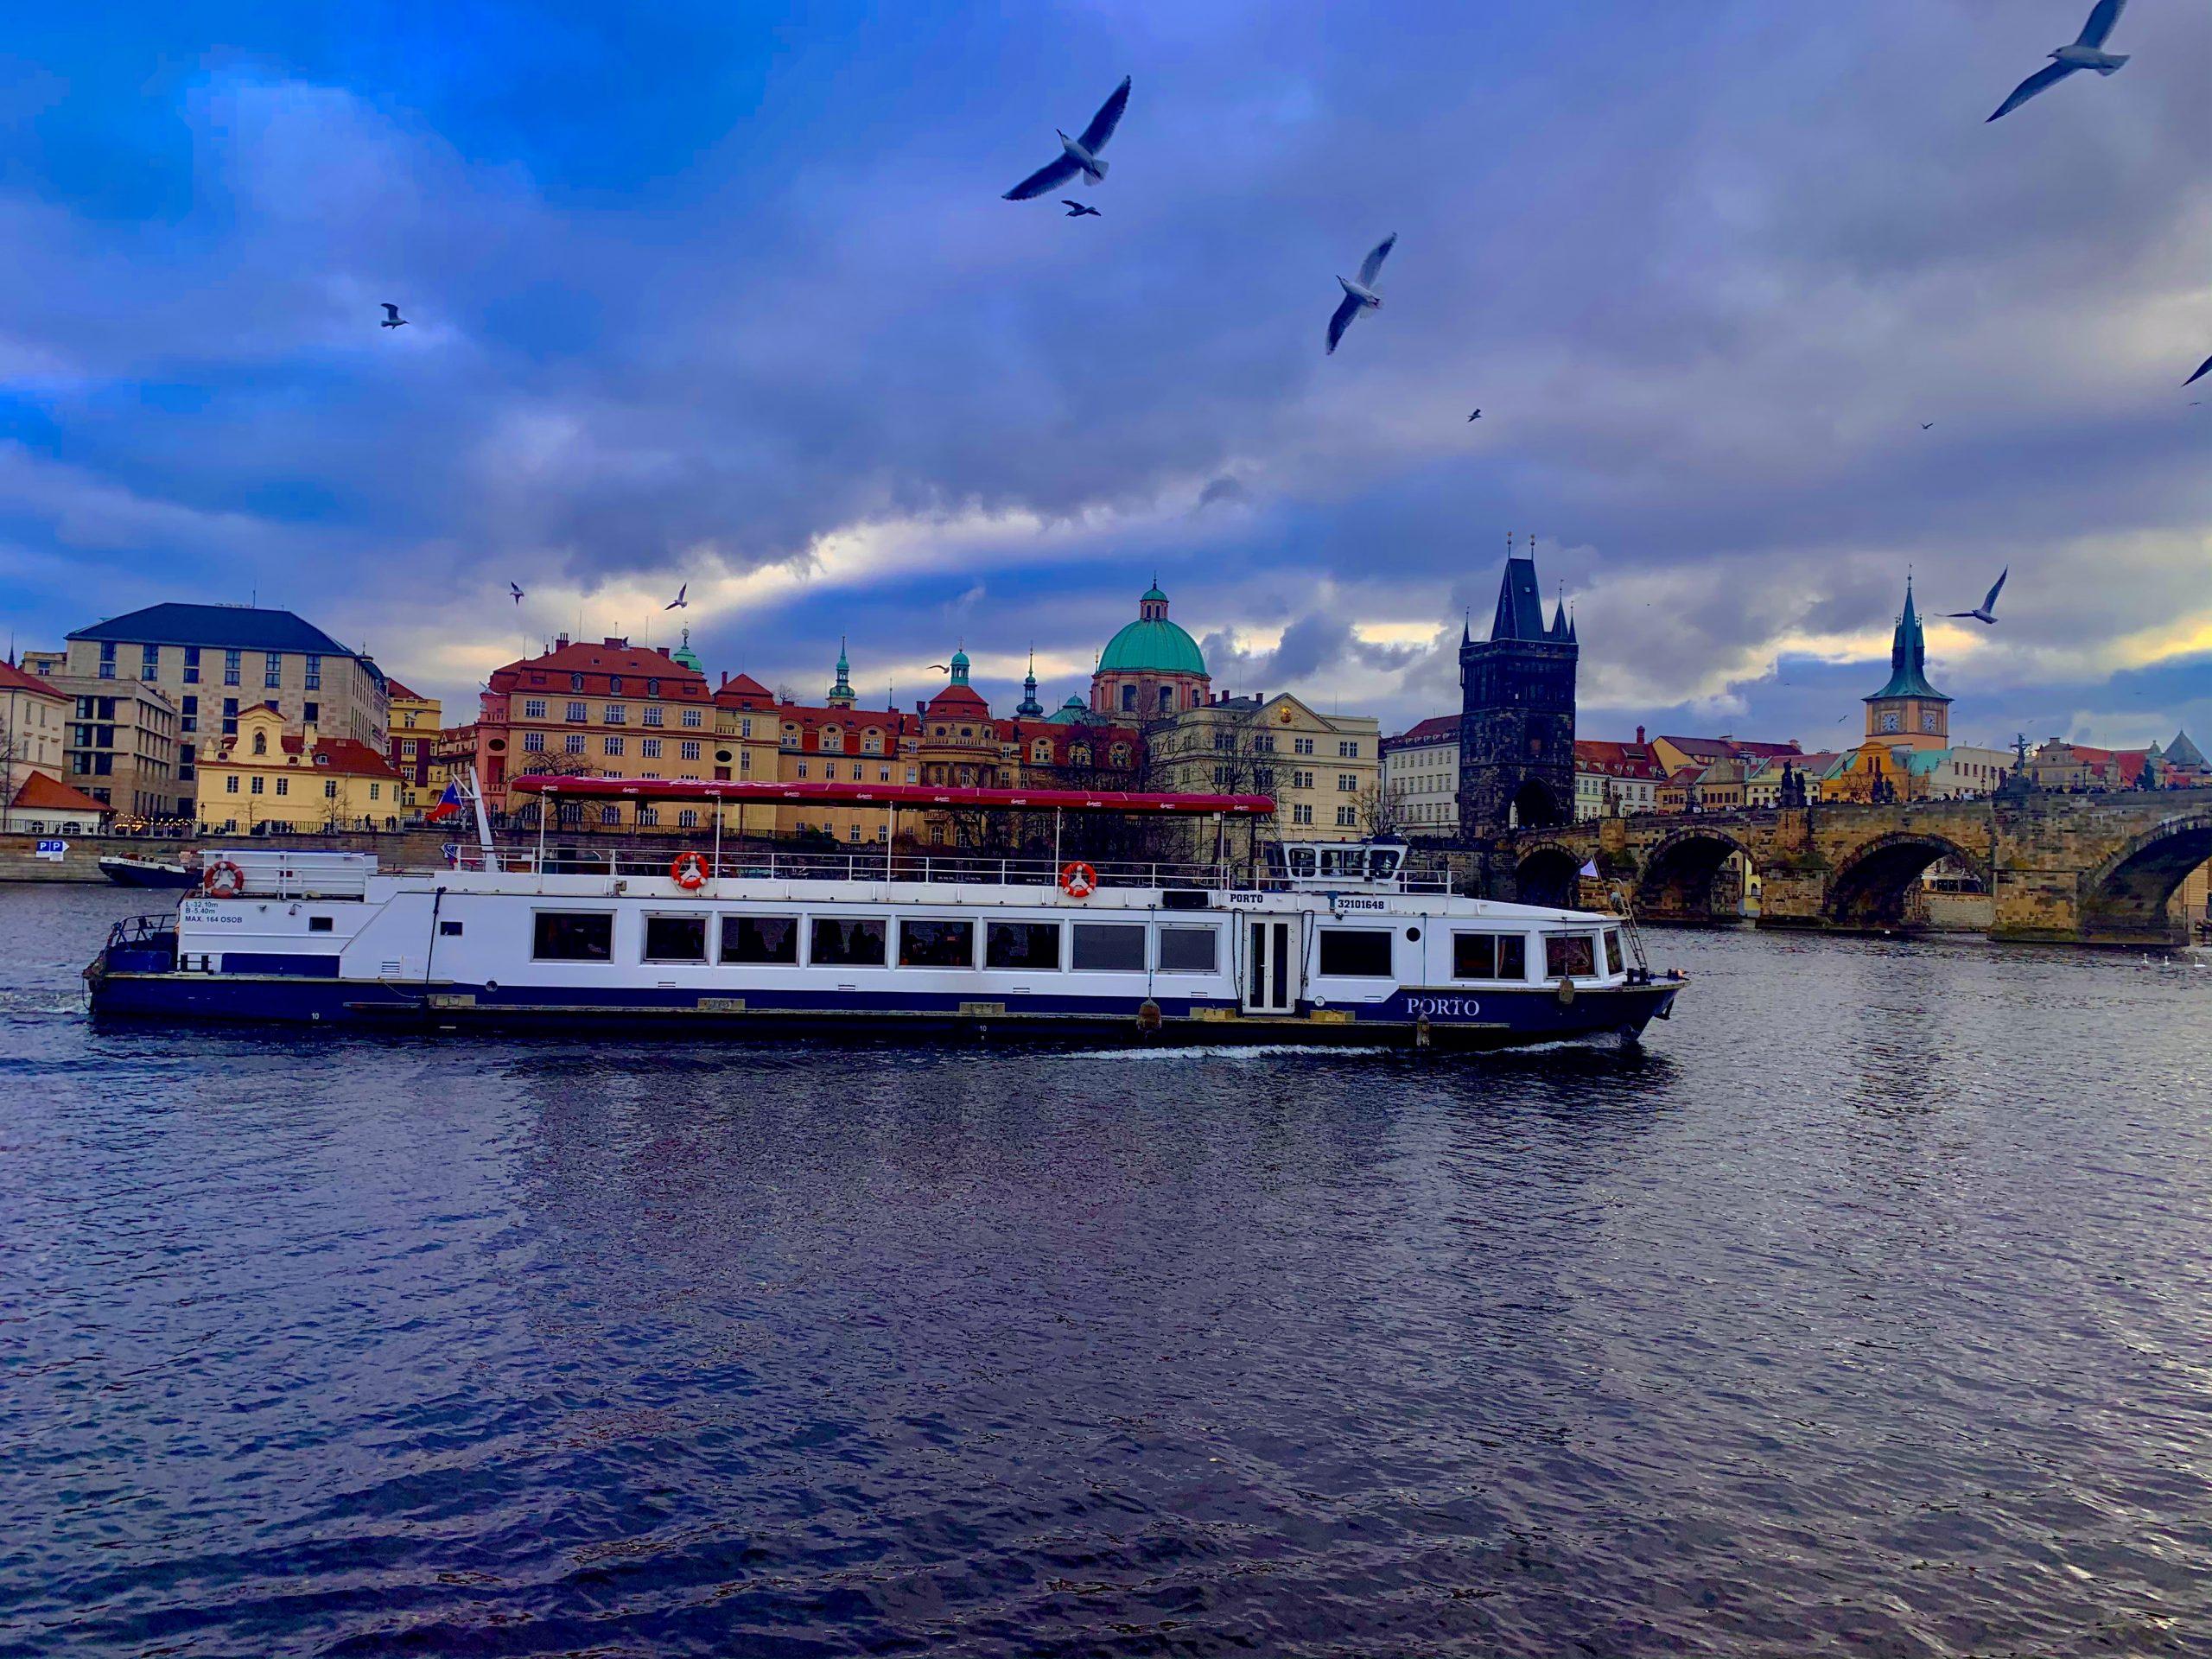 Aesthetic scene of Charles Bridge in Prague.